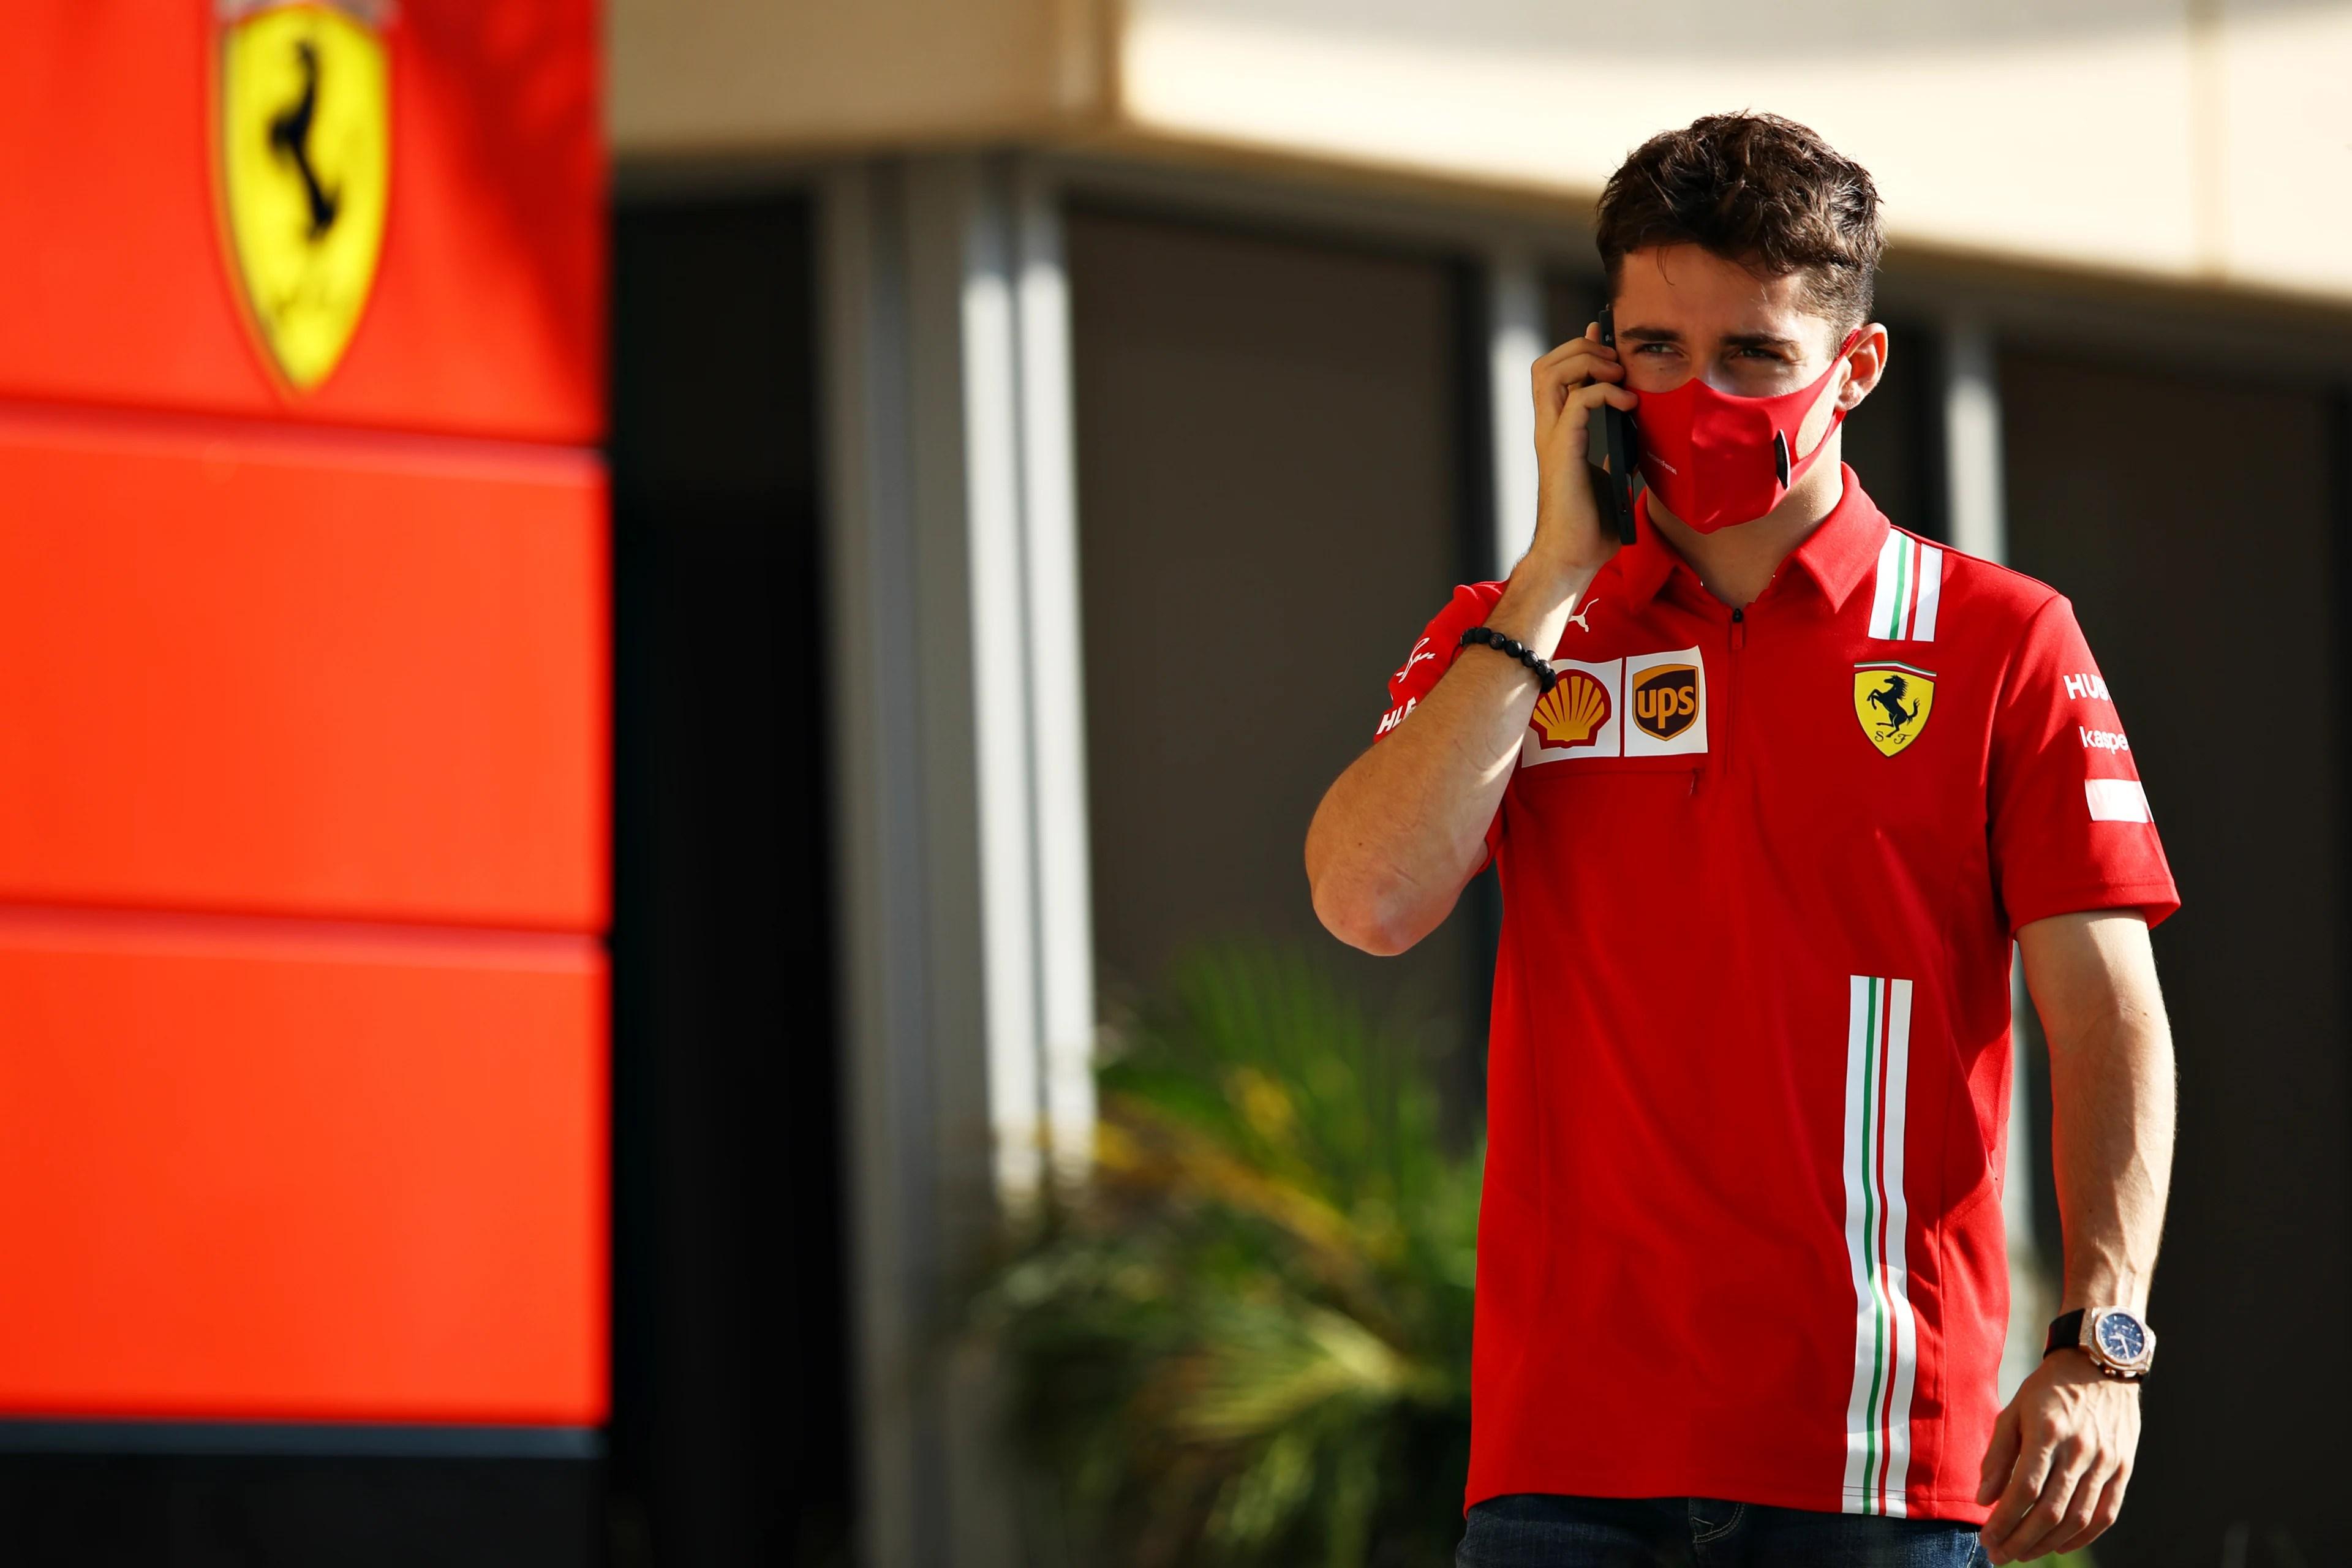 https www formula1 com en latest article leclerc keen on le mans 24 hours debut after ferrari commit to top class 77xcojserv2t9sqpa0amwe html